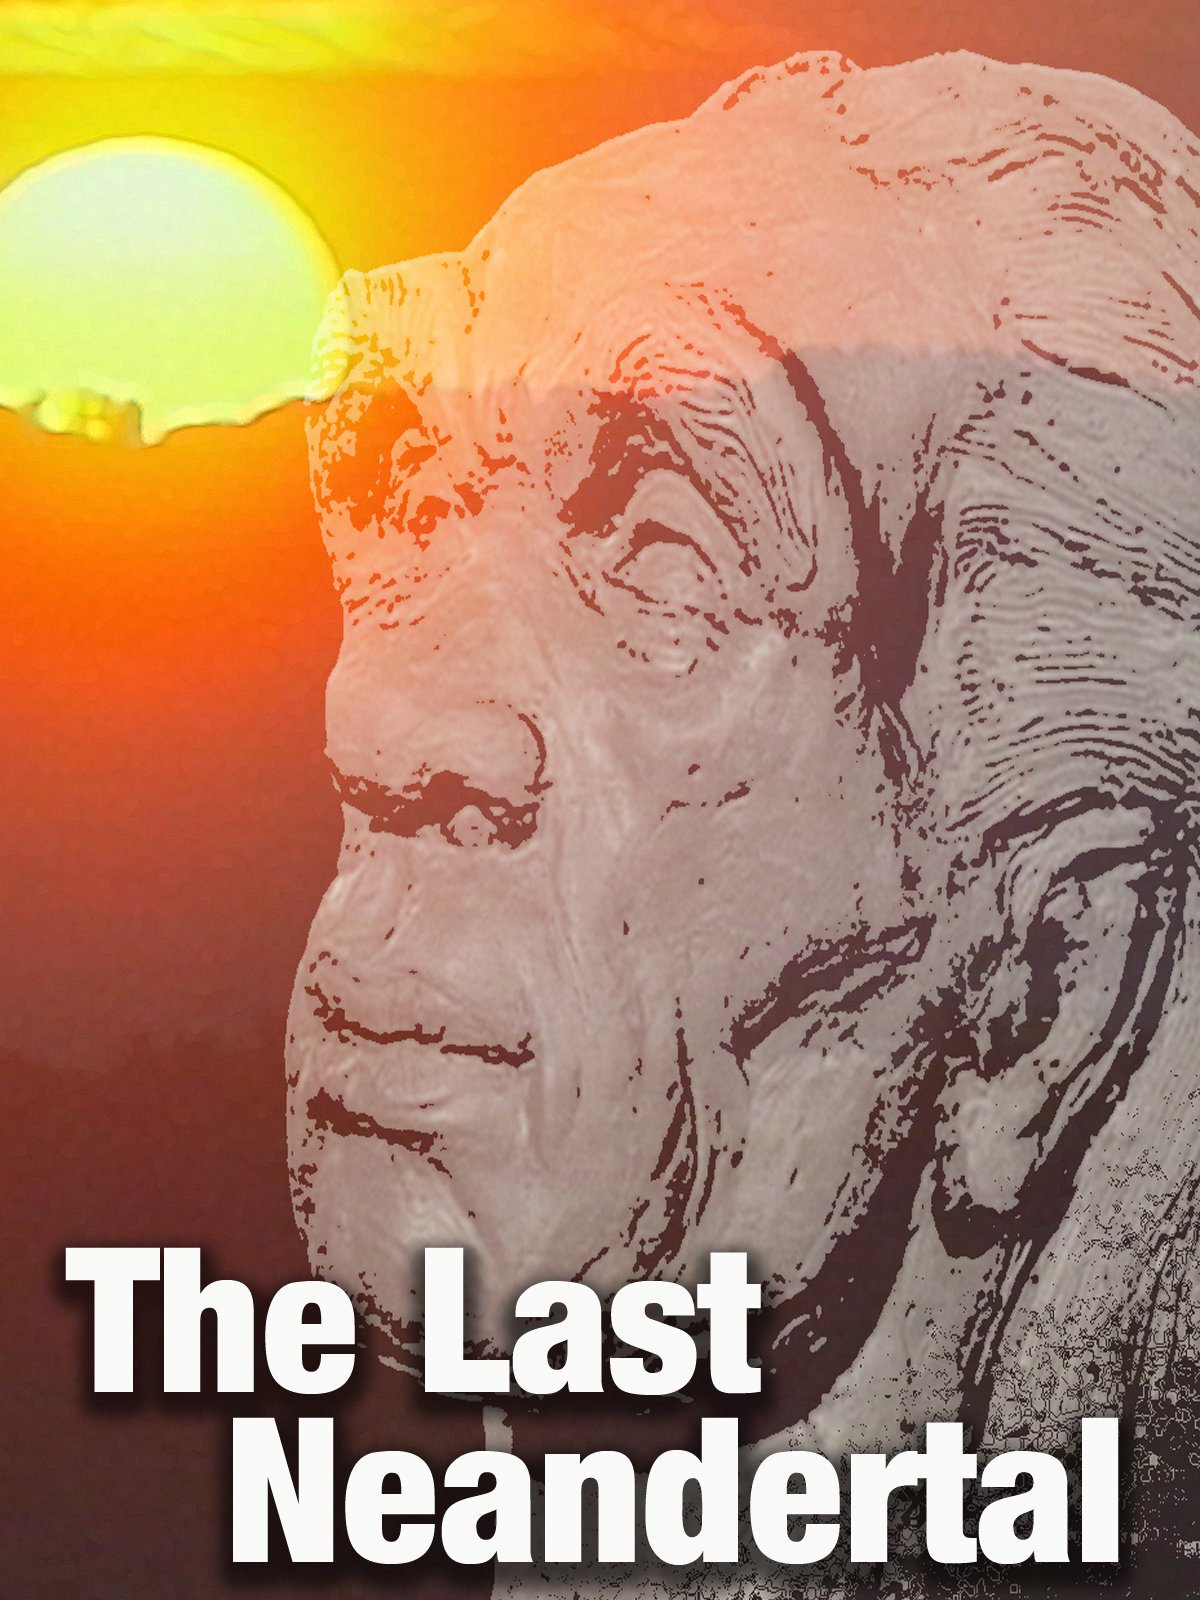 Last Neandertal, The on Amazon Prime Video UK